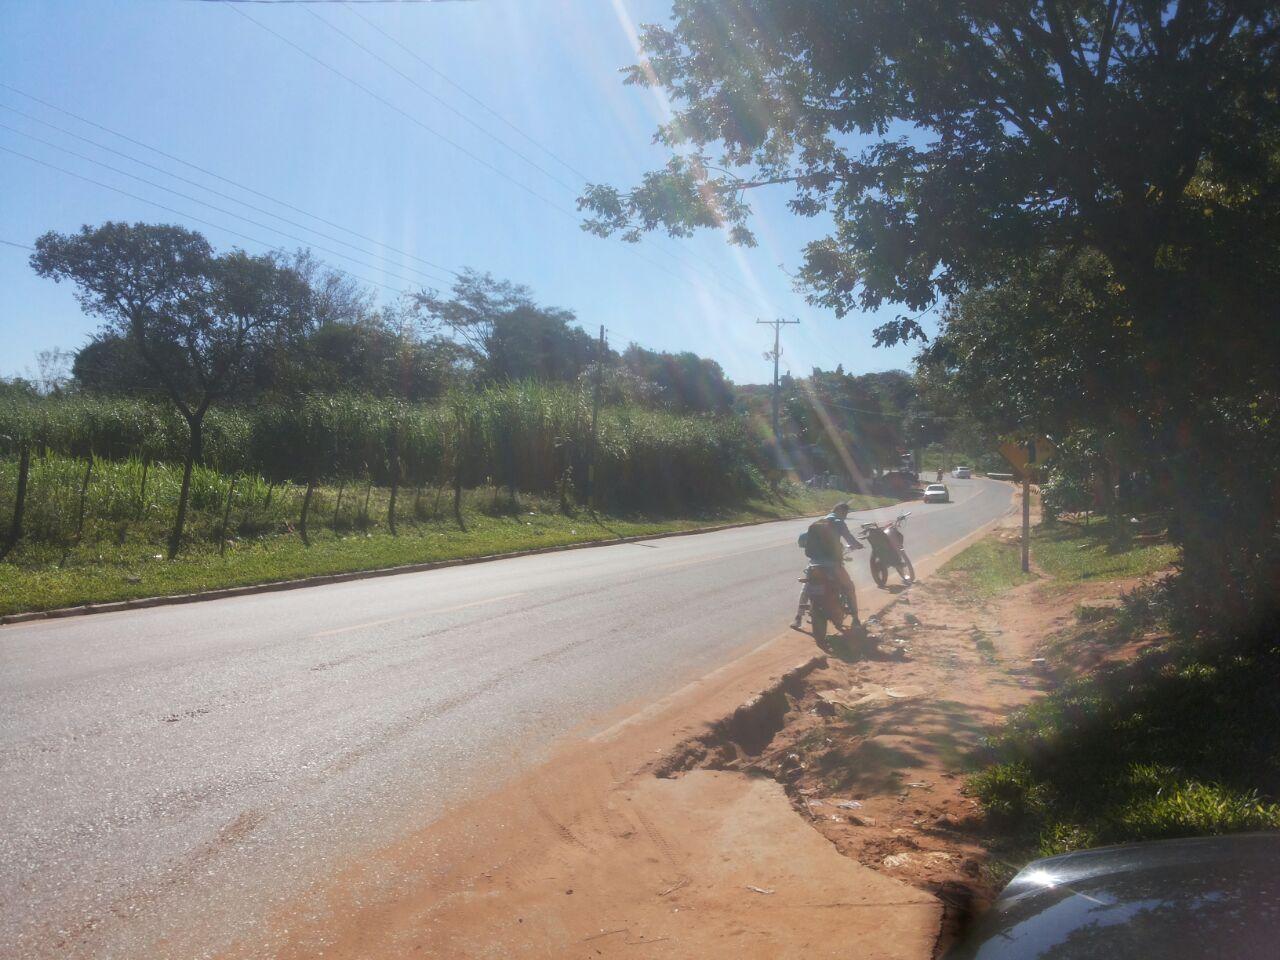 Vendo Terreno Especial Para Surtidor De 4775 M2 Cañada San Rafael, Luque